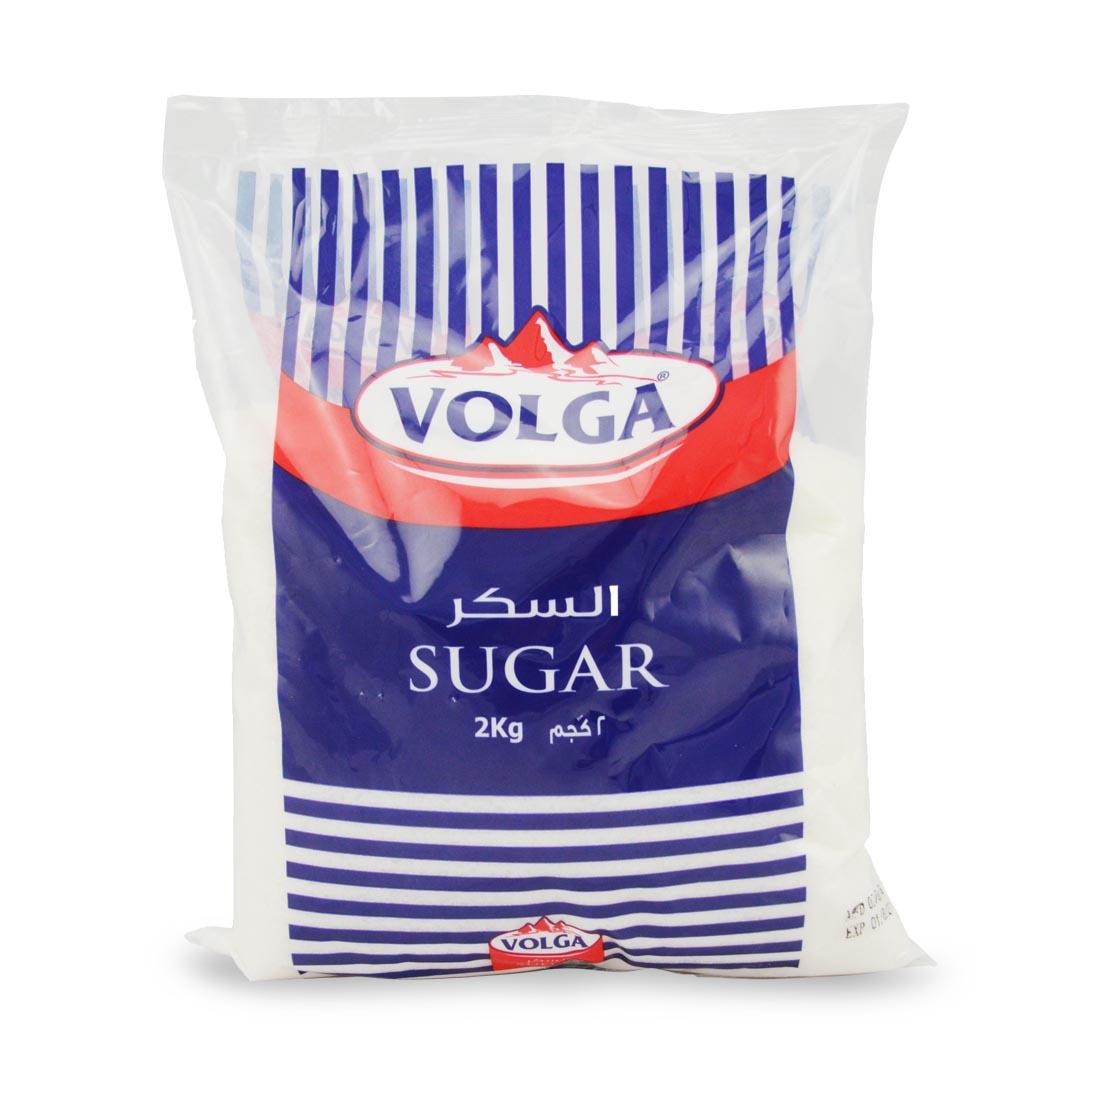 Volga White Sugar - 2kg (pc)